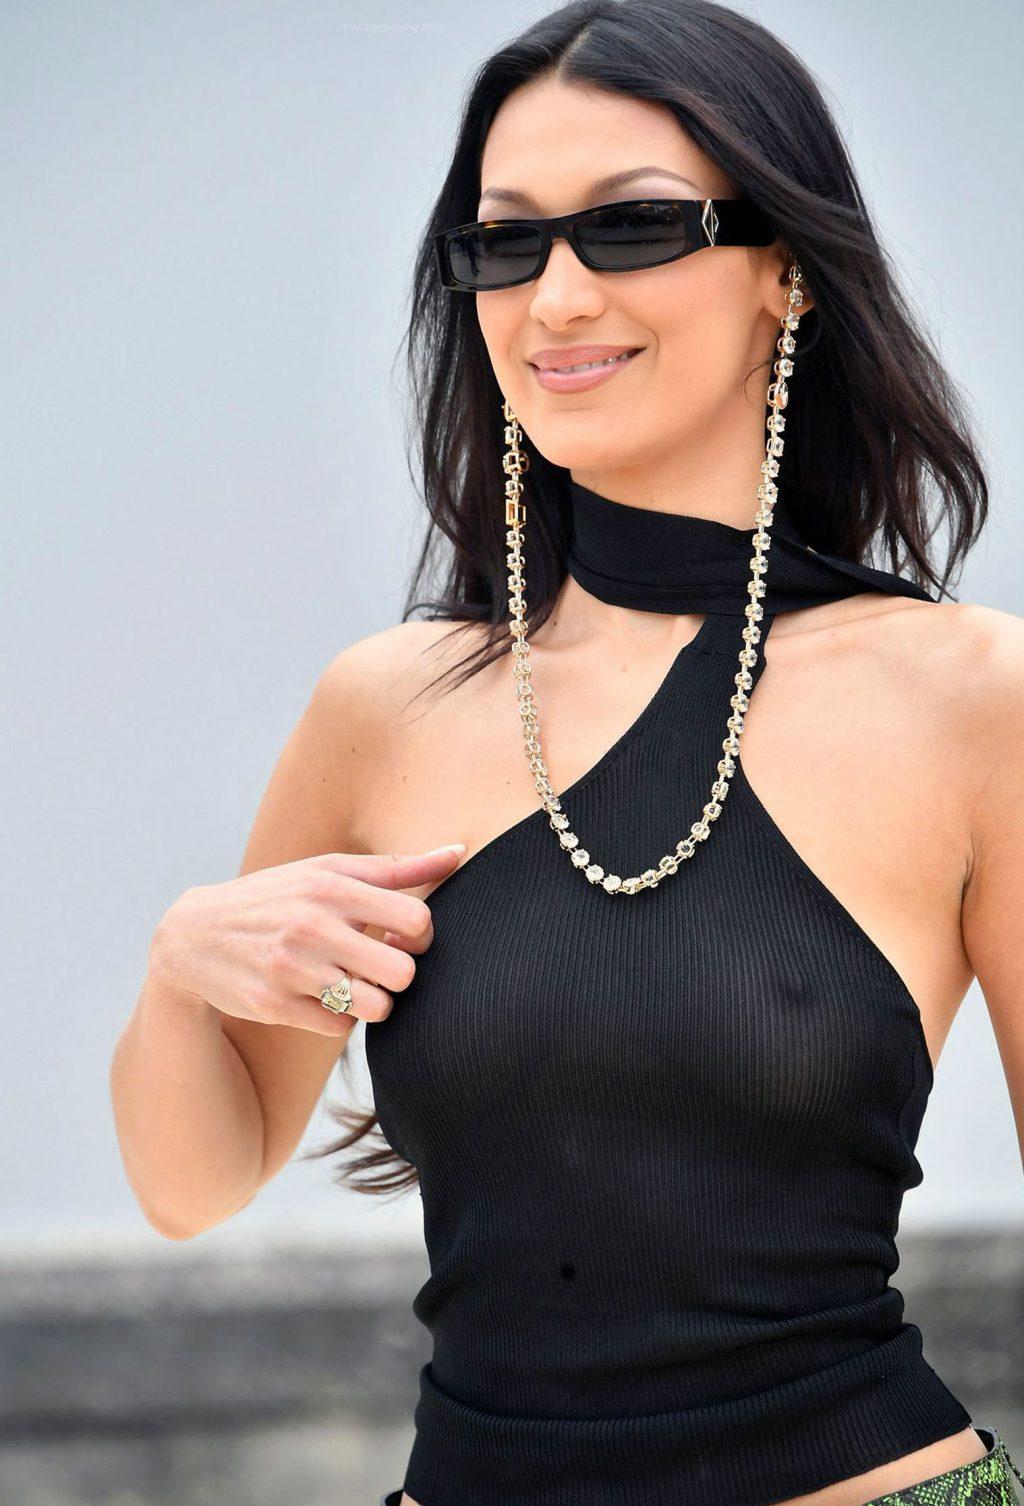 Bella Hadid tits